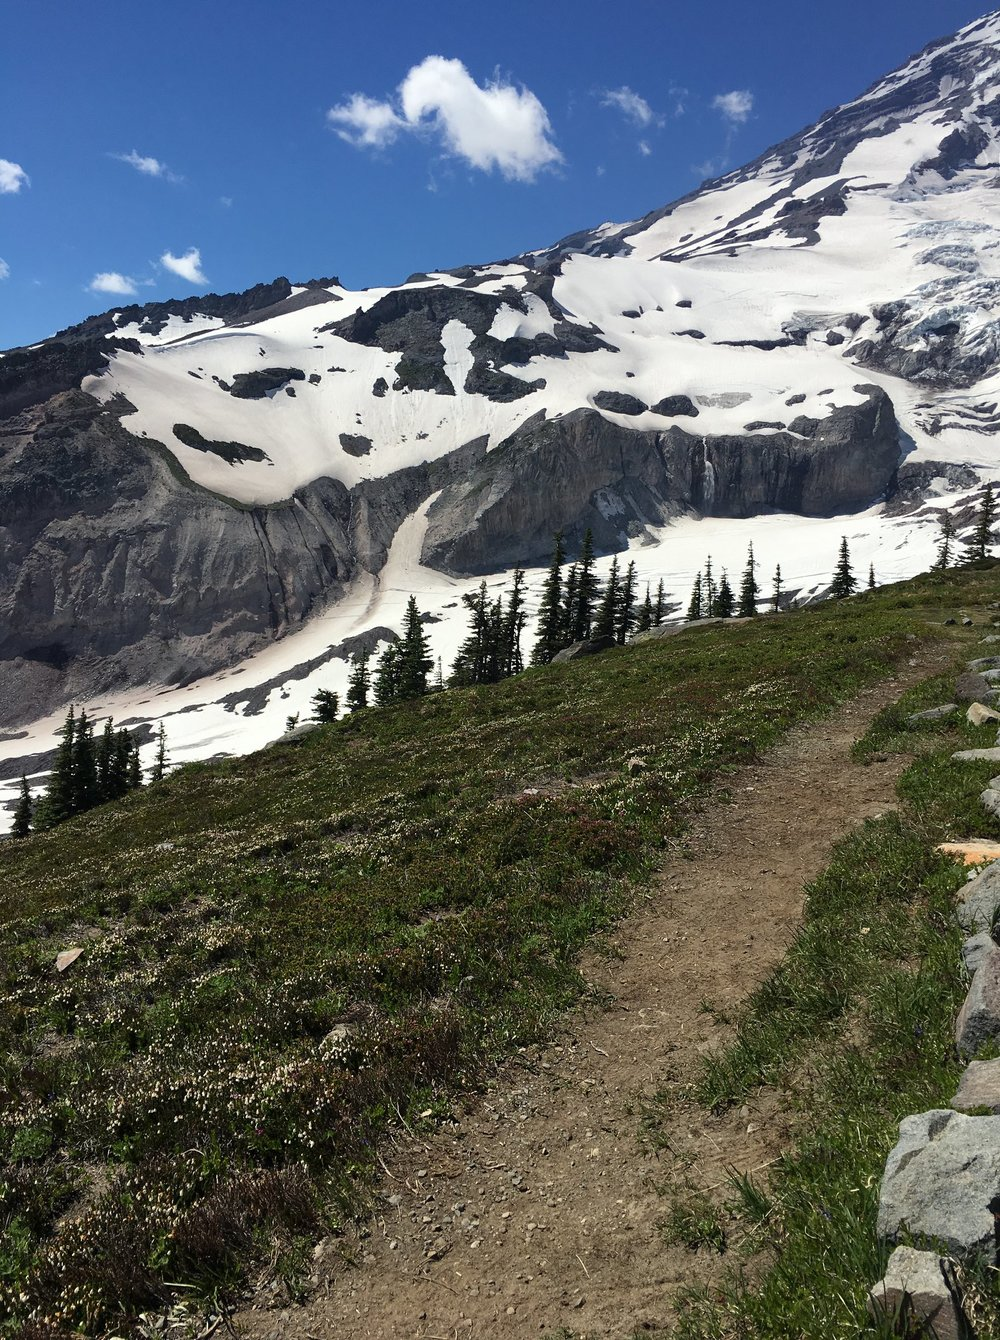 Trail on the way to Mount Rainier summit in Washington